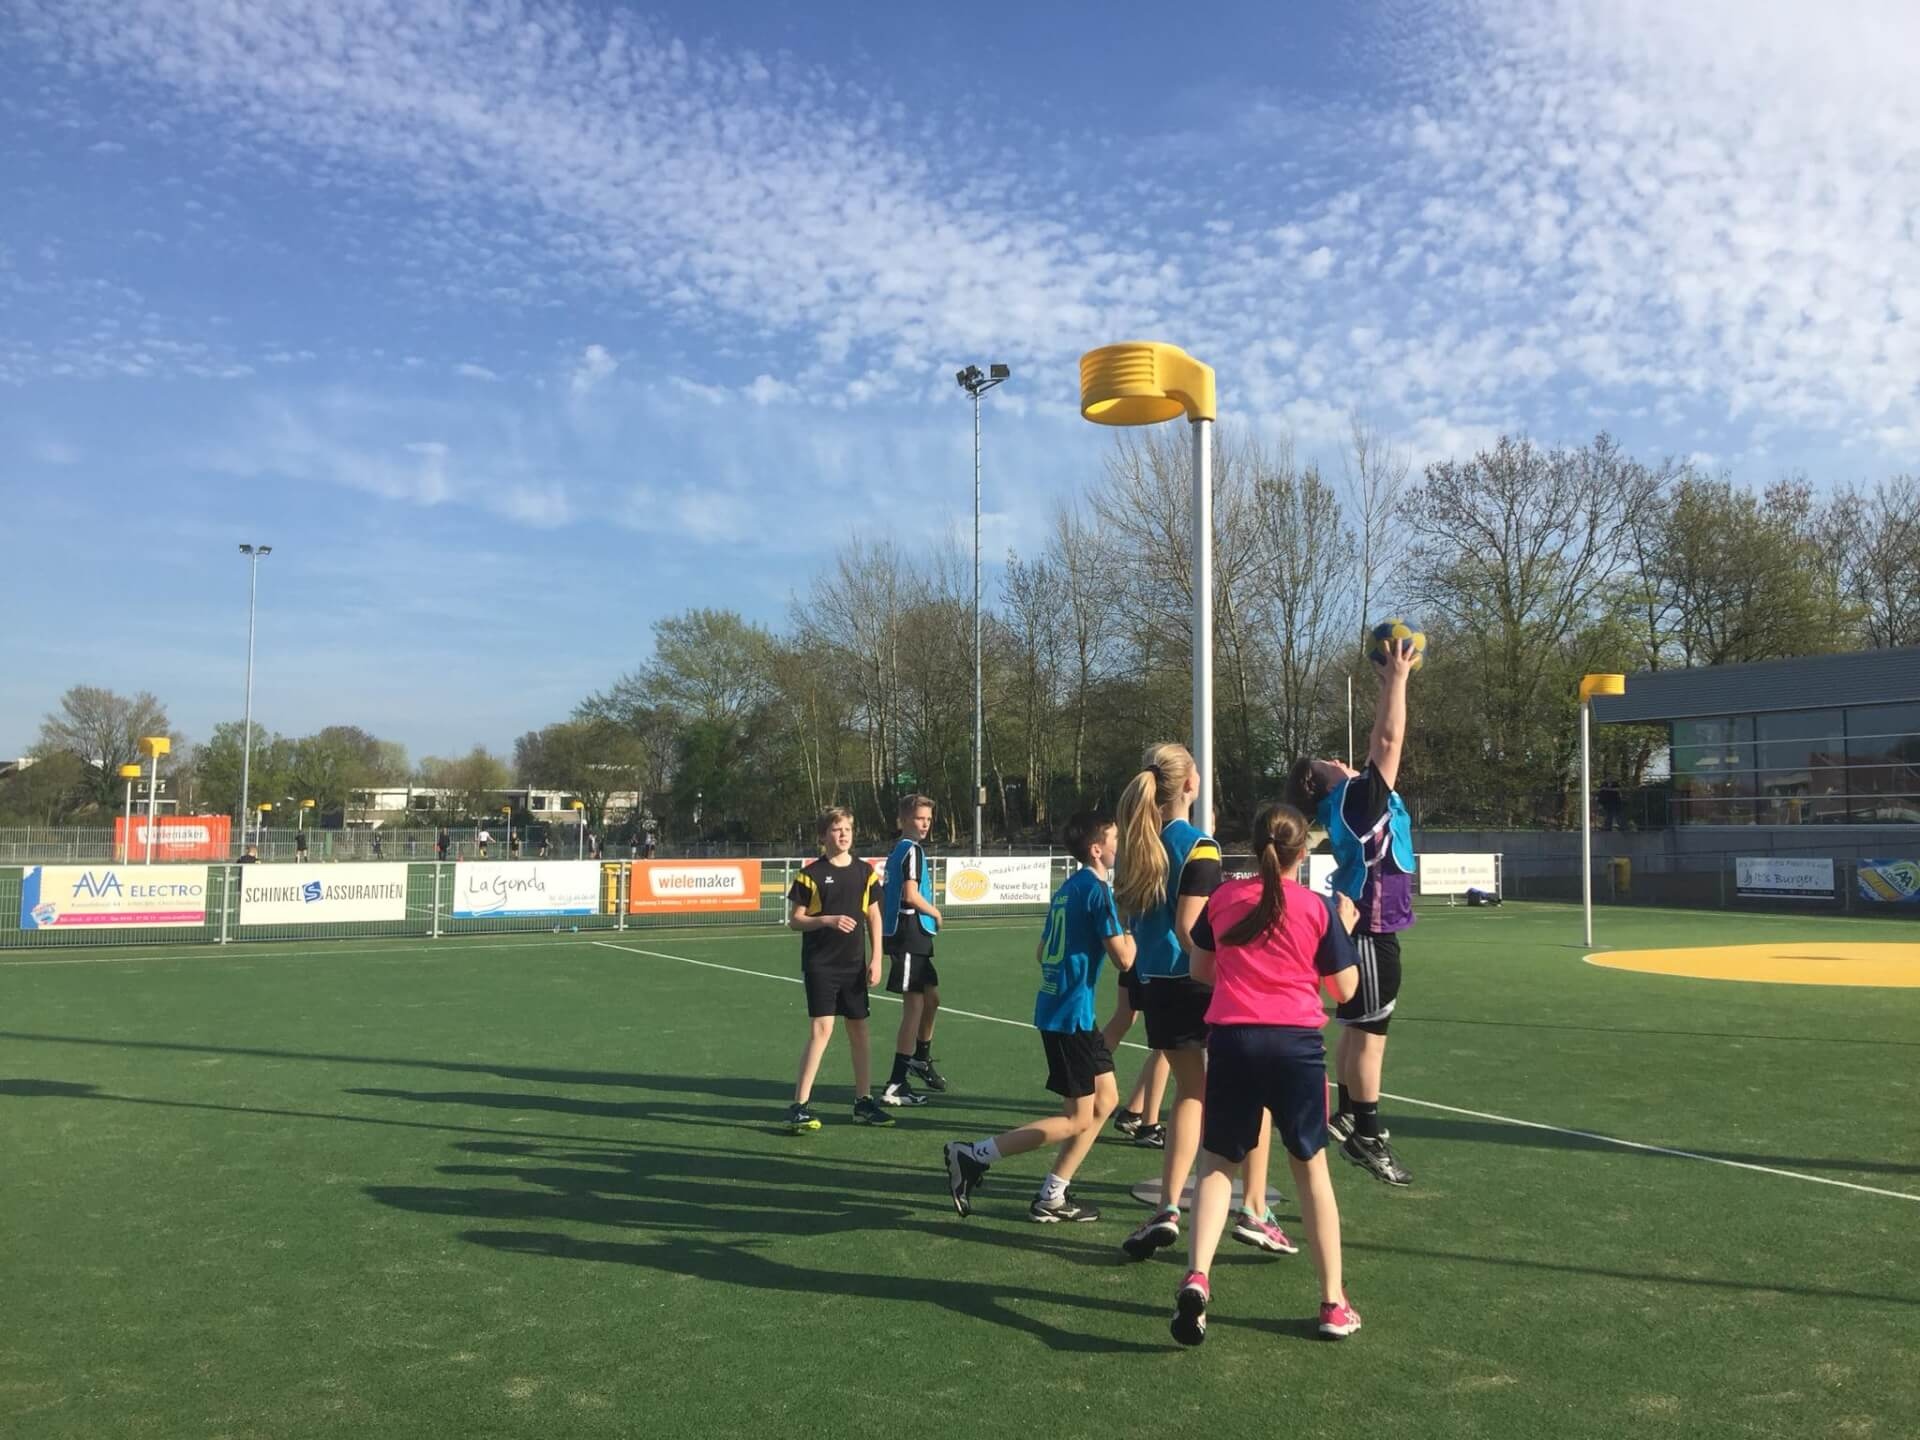 Trainingstijden en startdata 1e helft veld seizoen 2018-2019